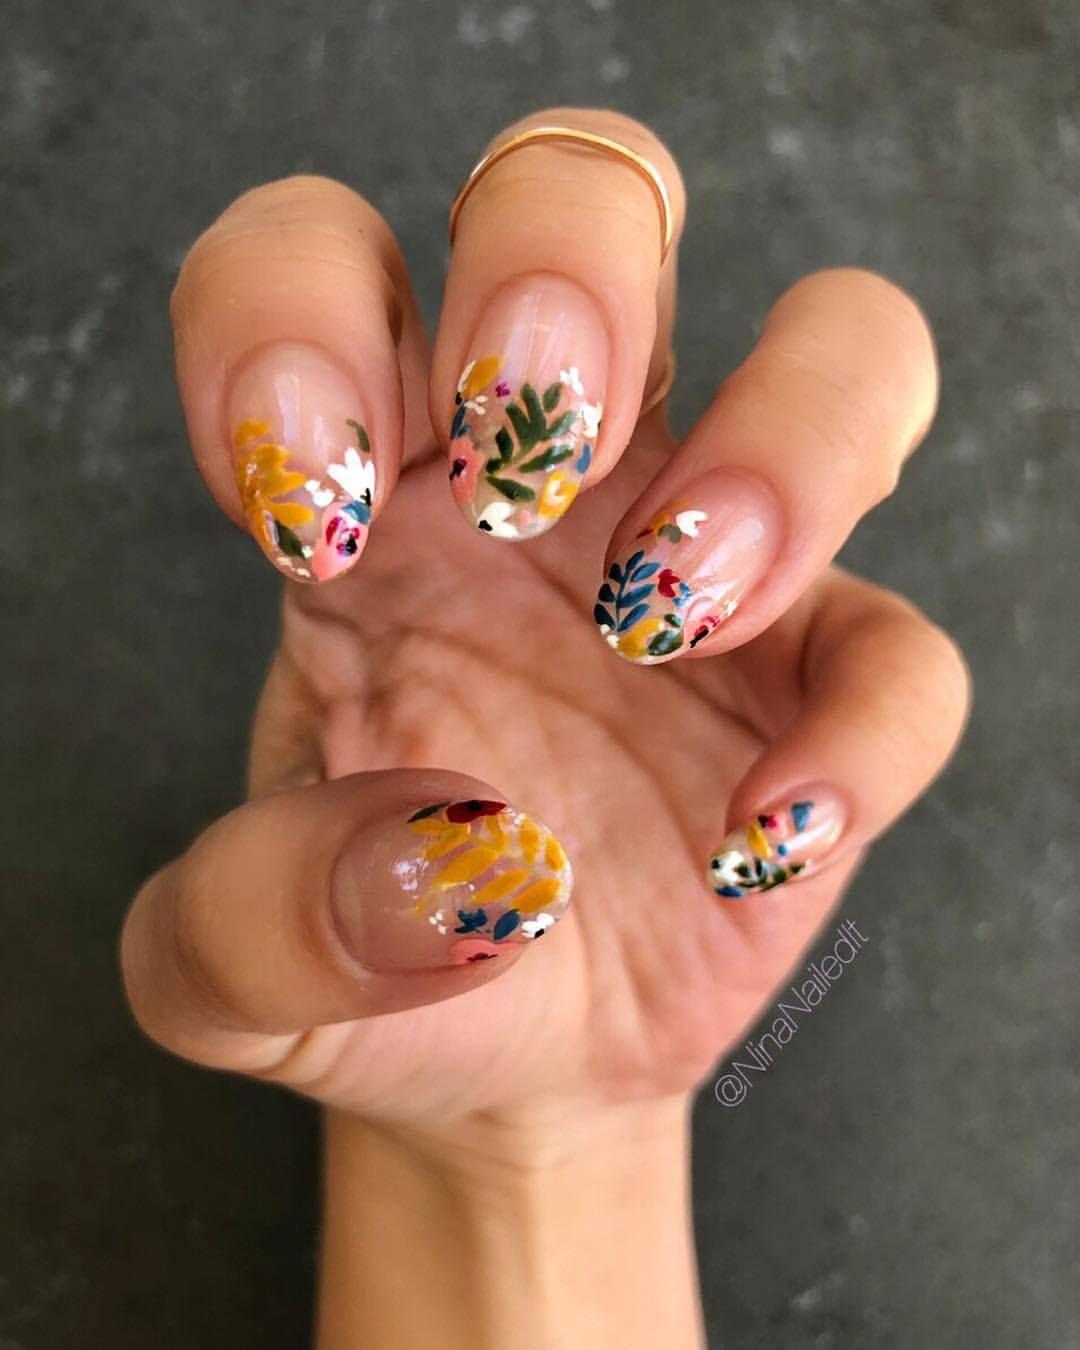 Boston Nail Artist Teacher Adrenaline Junkie Crystal Nails Floral Nails Easter Nails